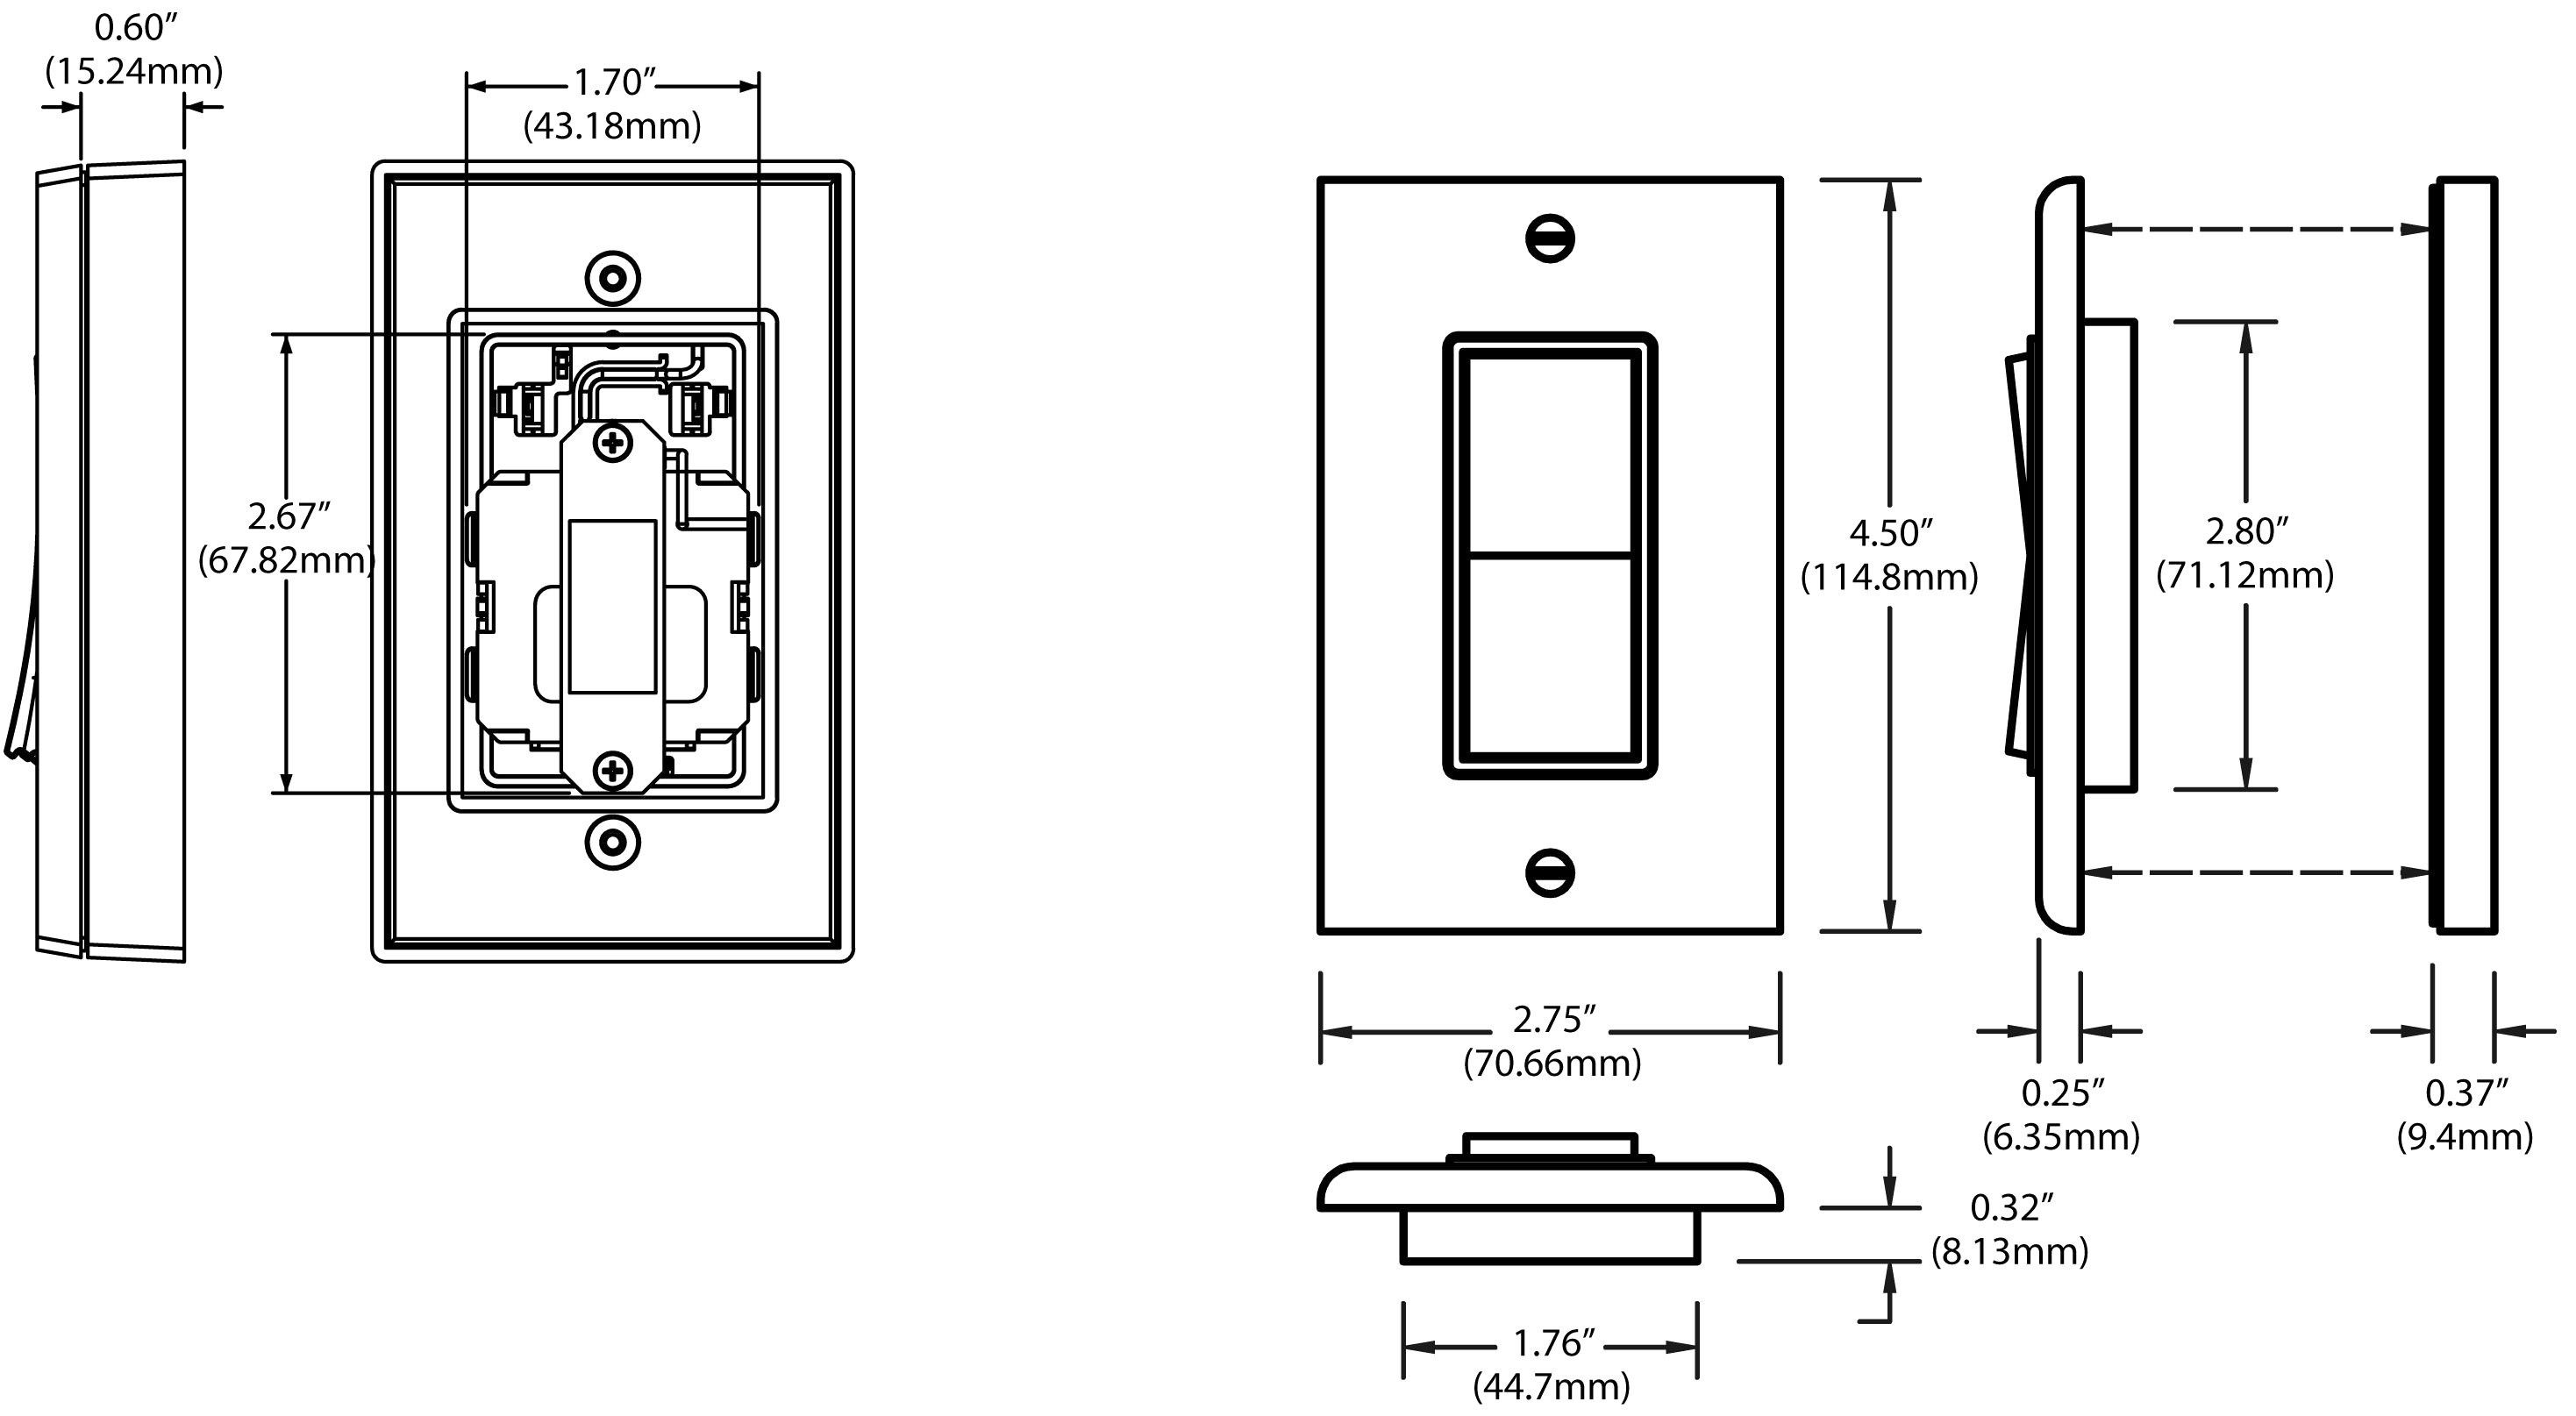 Beautiful Leviton Light Switch Wiring Diagram diagrams